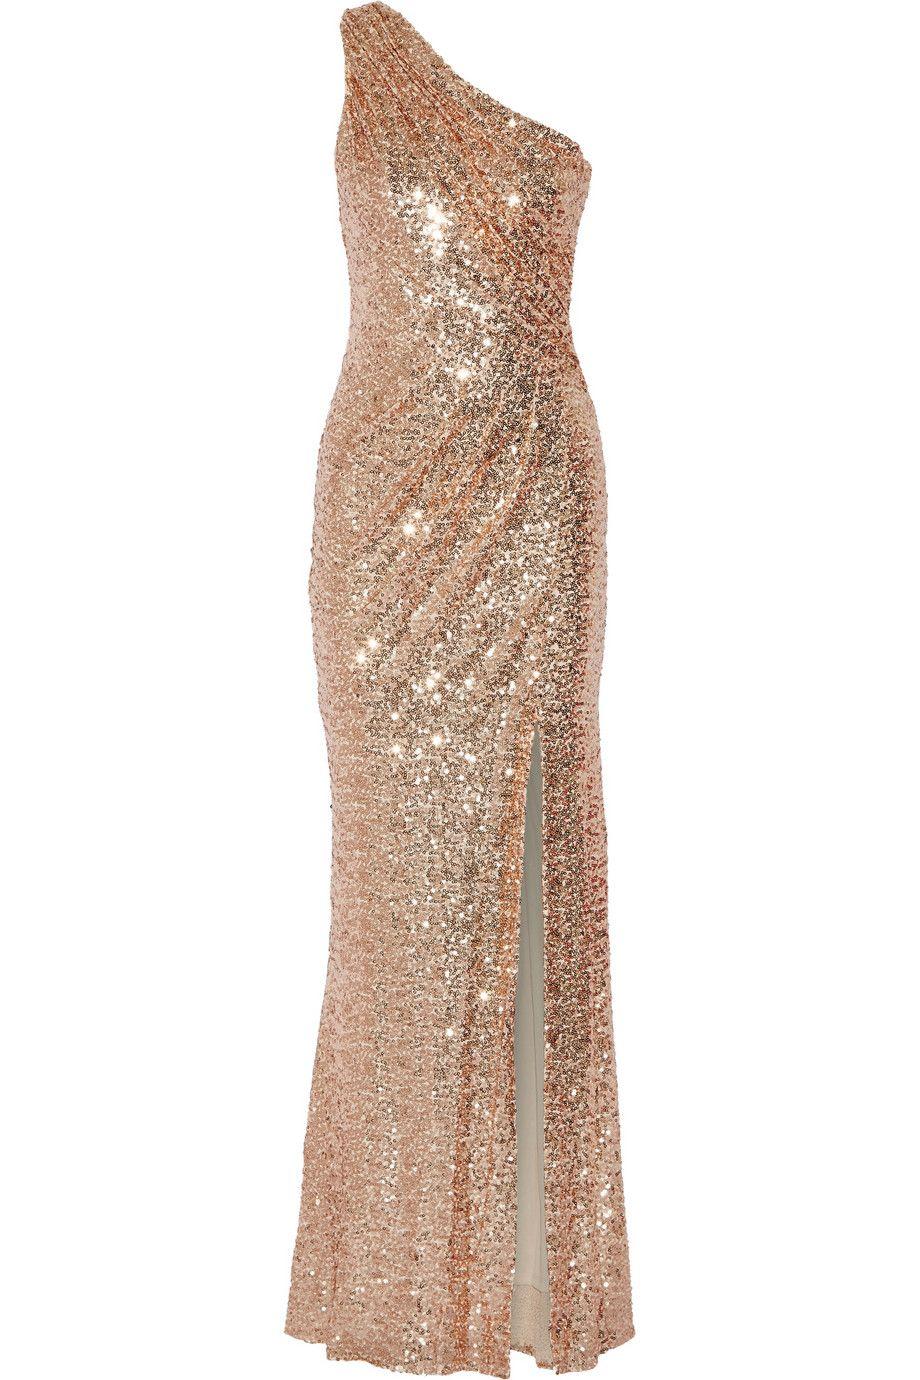 BADGLEY MISCHKA. Sequin Bridesmaid DressesSparkly ...